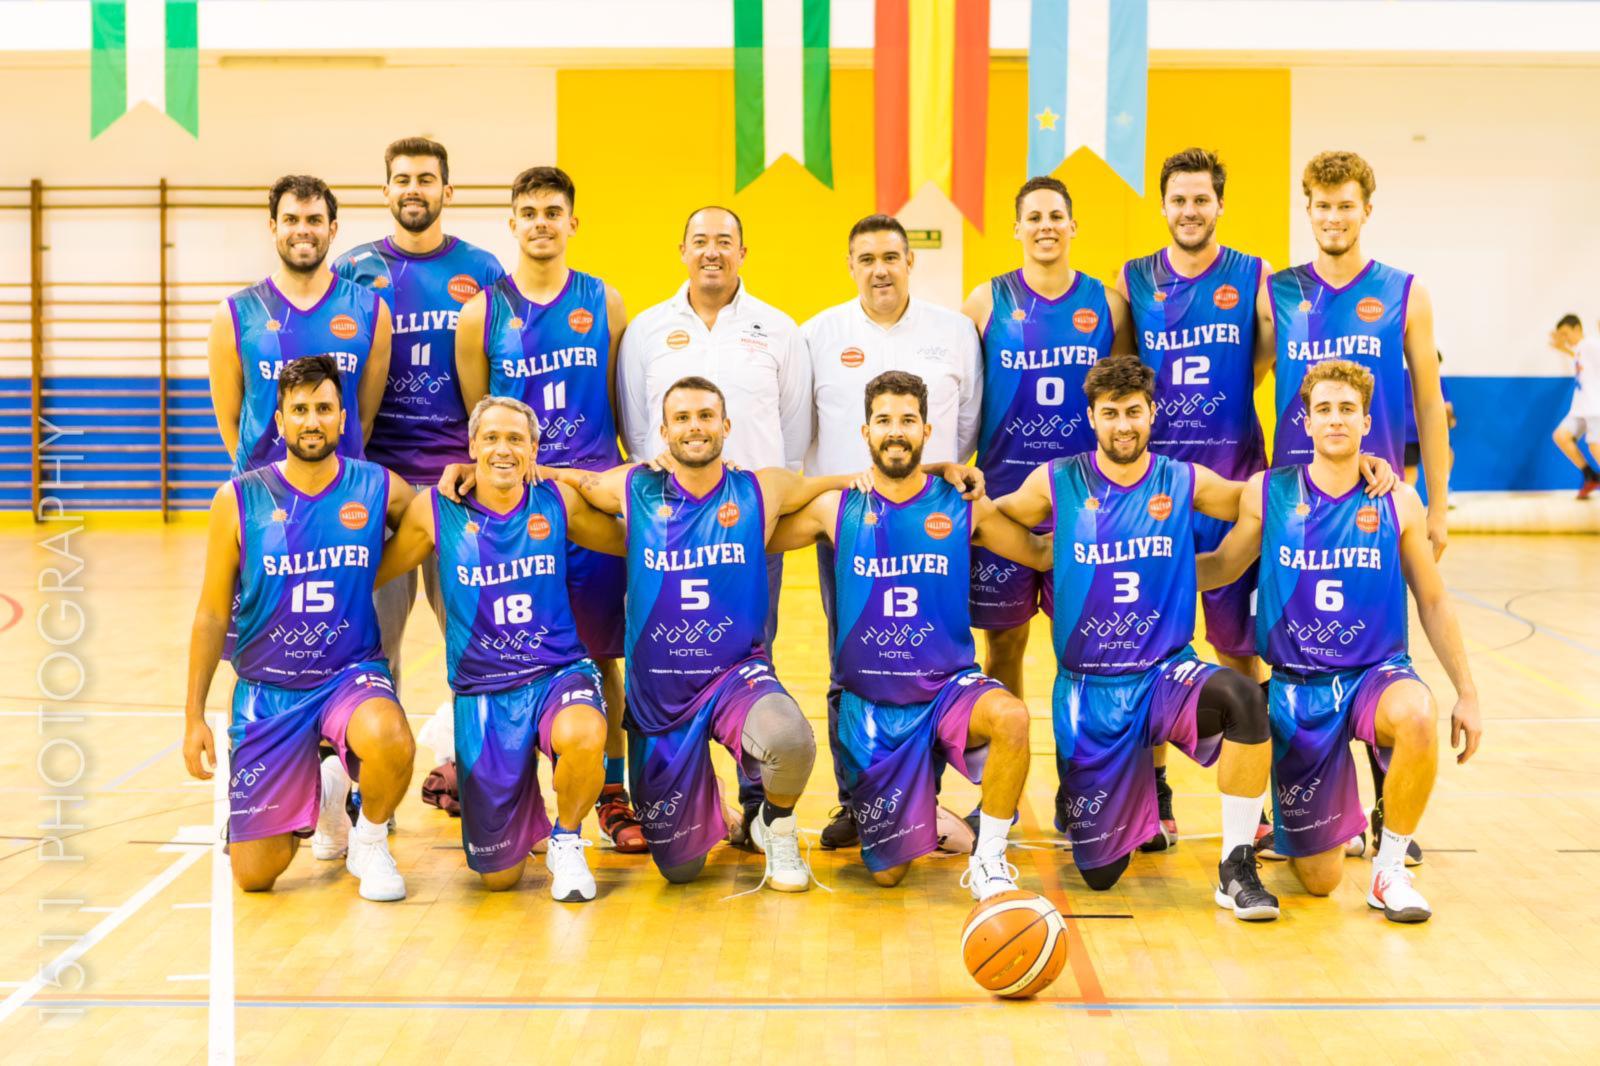 foto-equipo-club-baloncesto-salliver-01